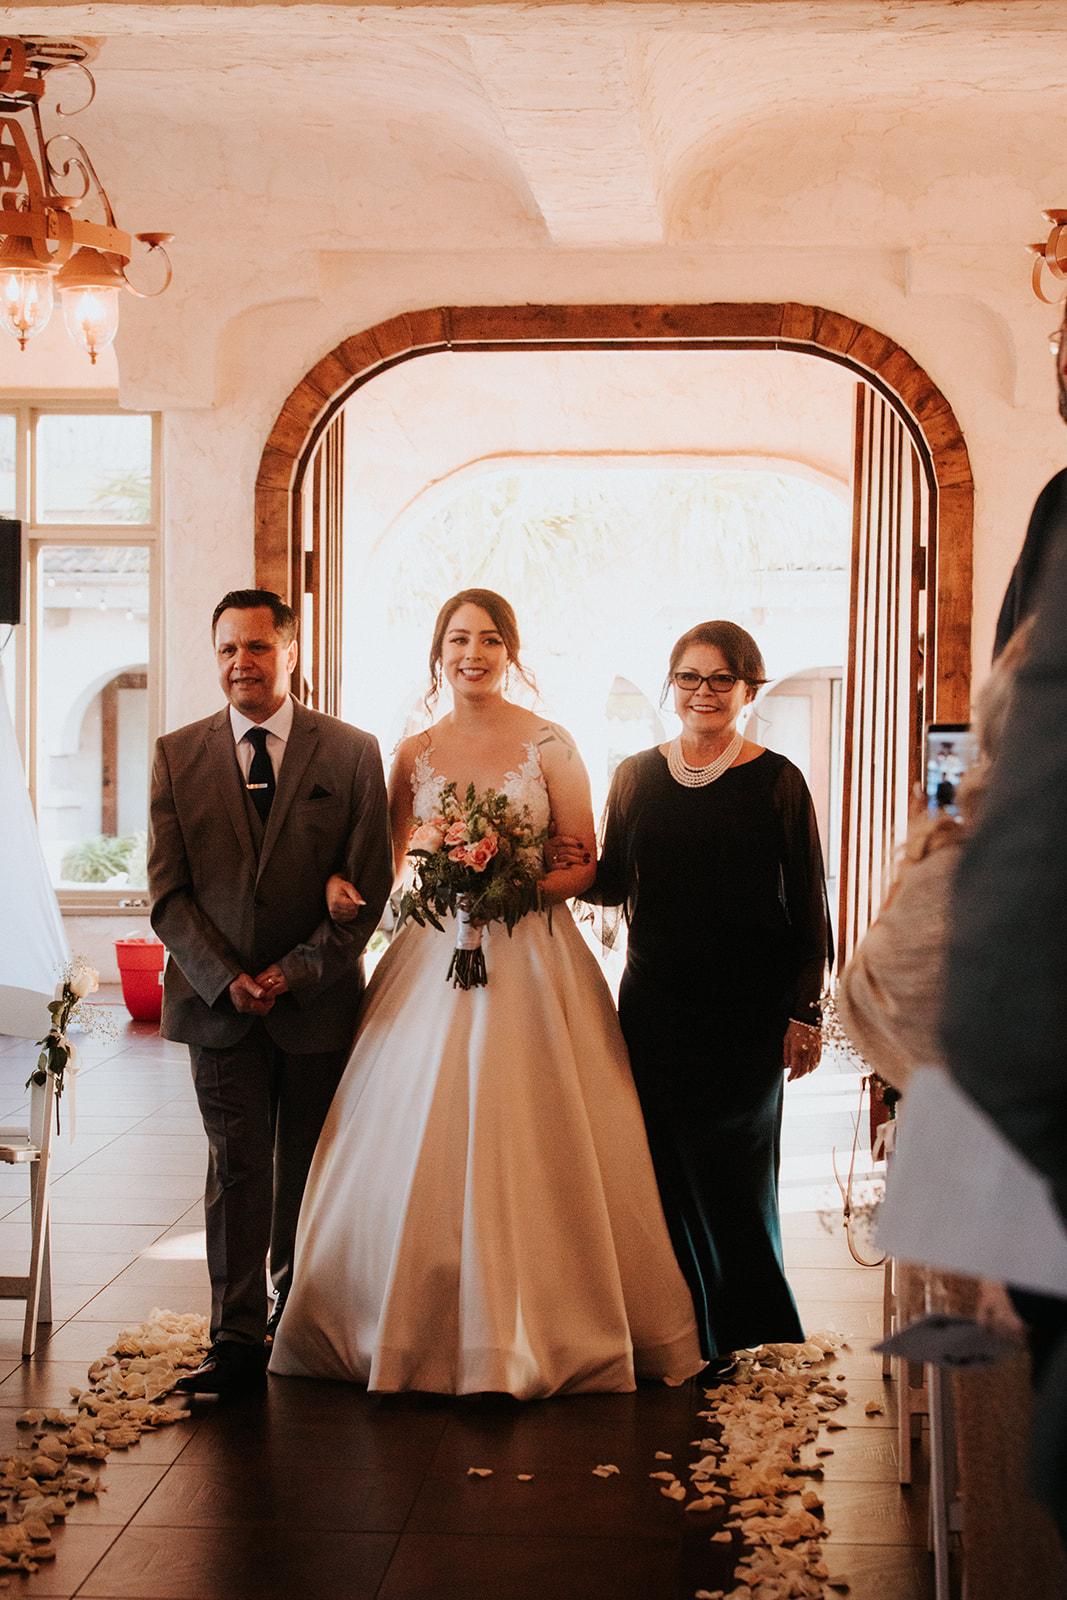 Jessica_+_JD_Wedding_-_Diana_Ascarrunz_Photography-392.jpg